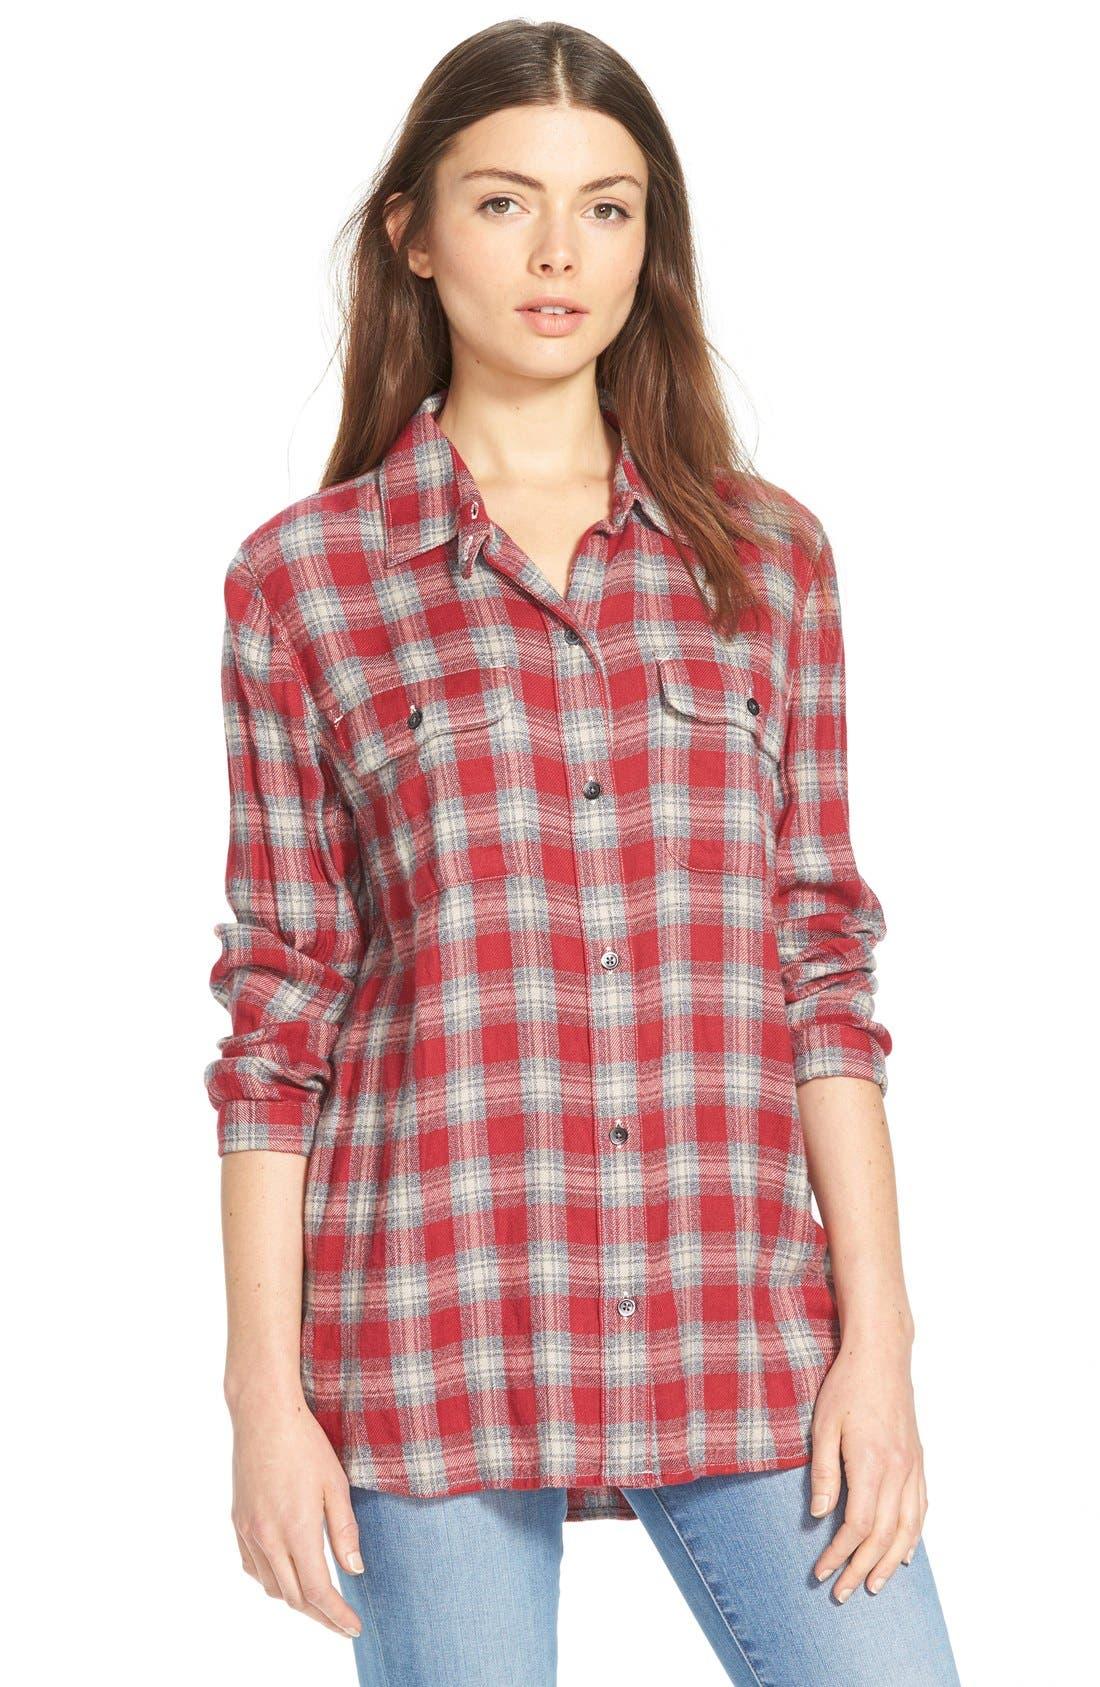 Alternate Image 1 Selected - Madewell 'Fairfax Plaid' Ex-Boyfriend Shirt